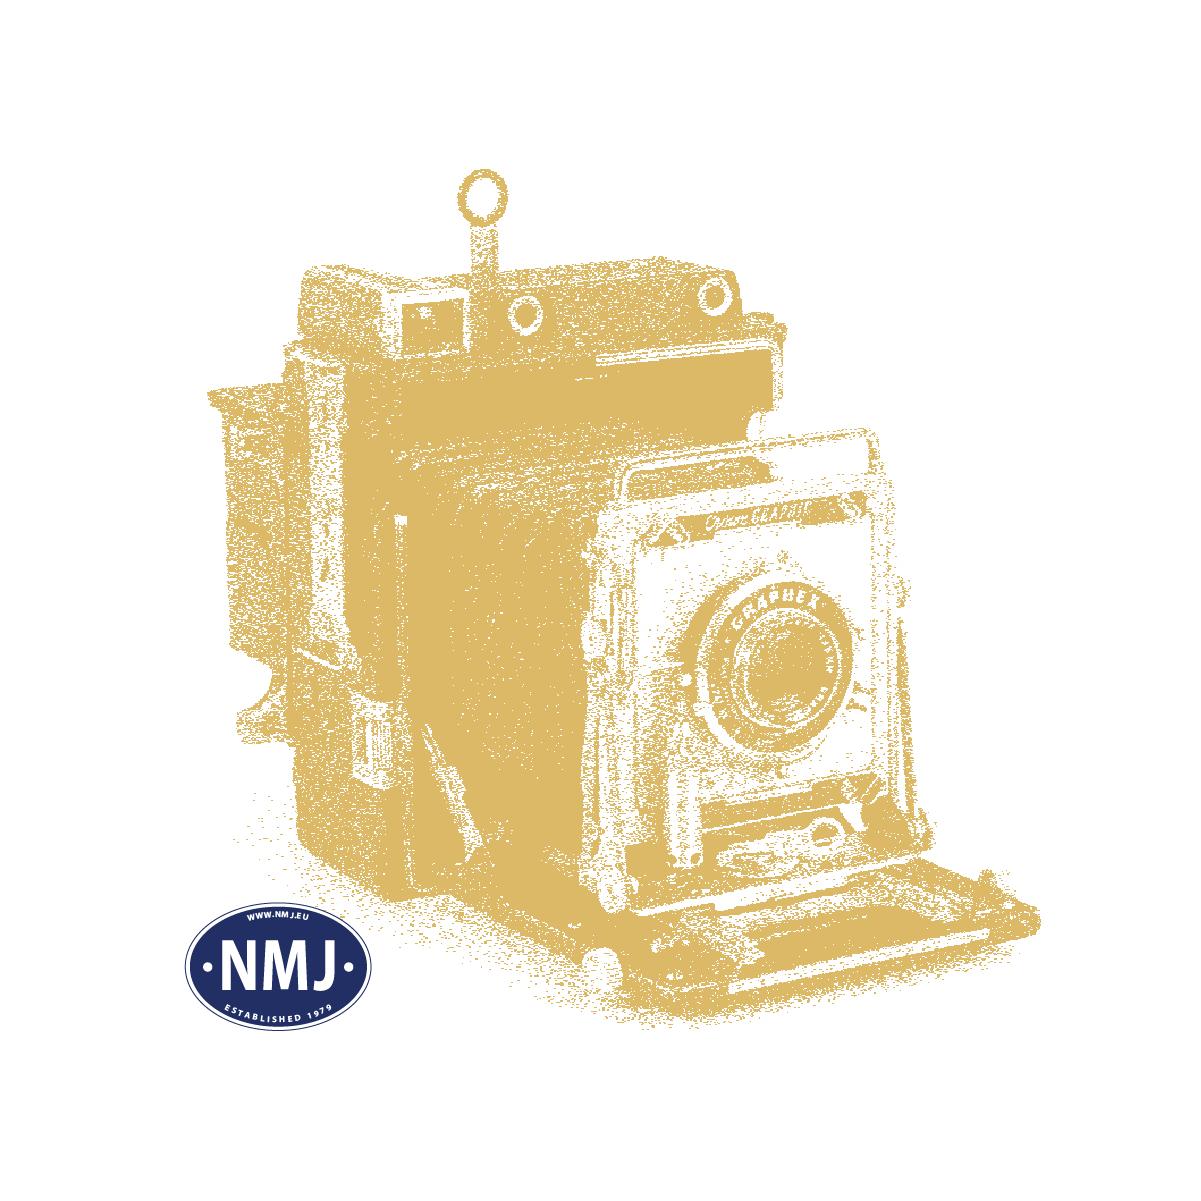 NOC37808 - Kanotur, N-Skala